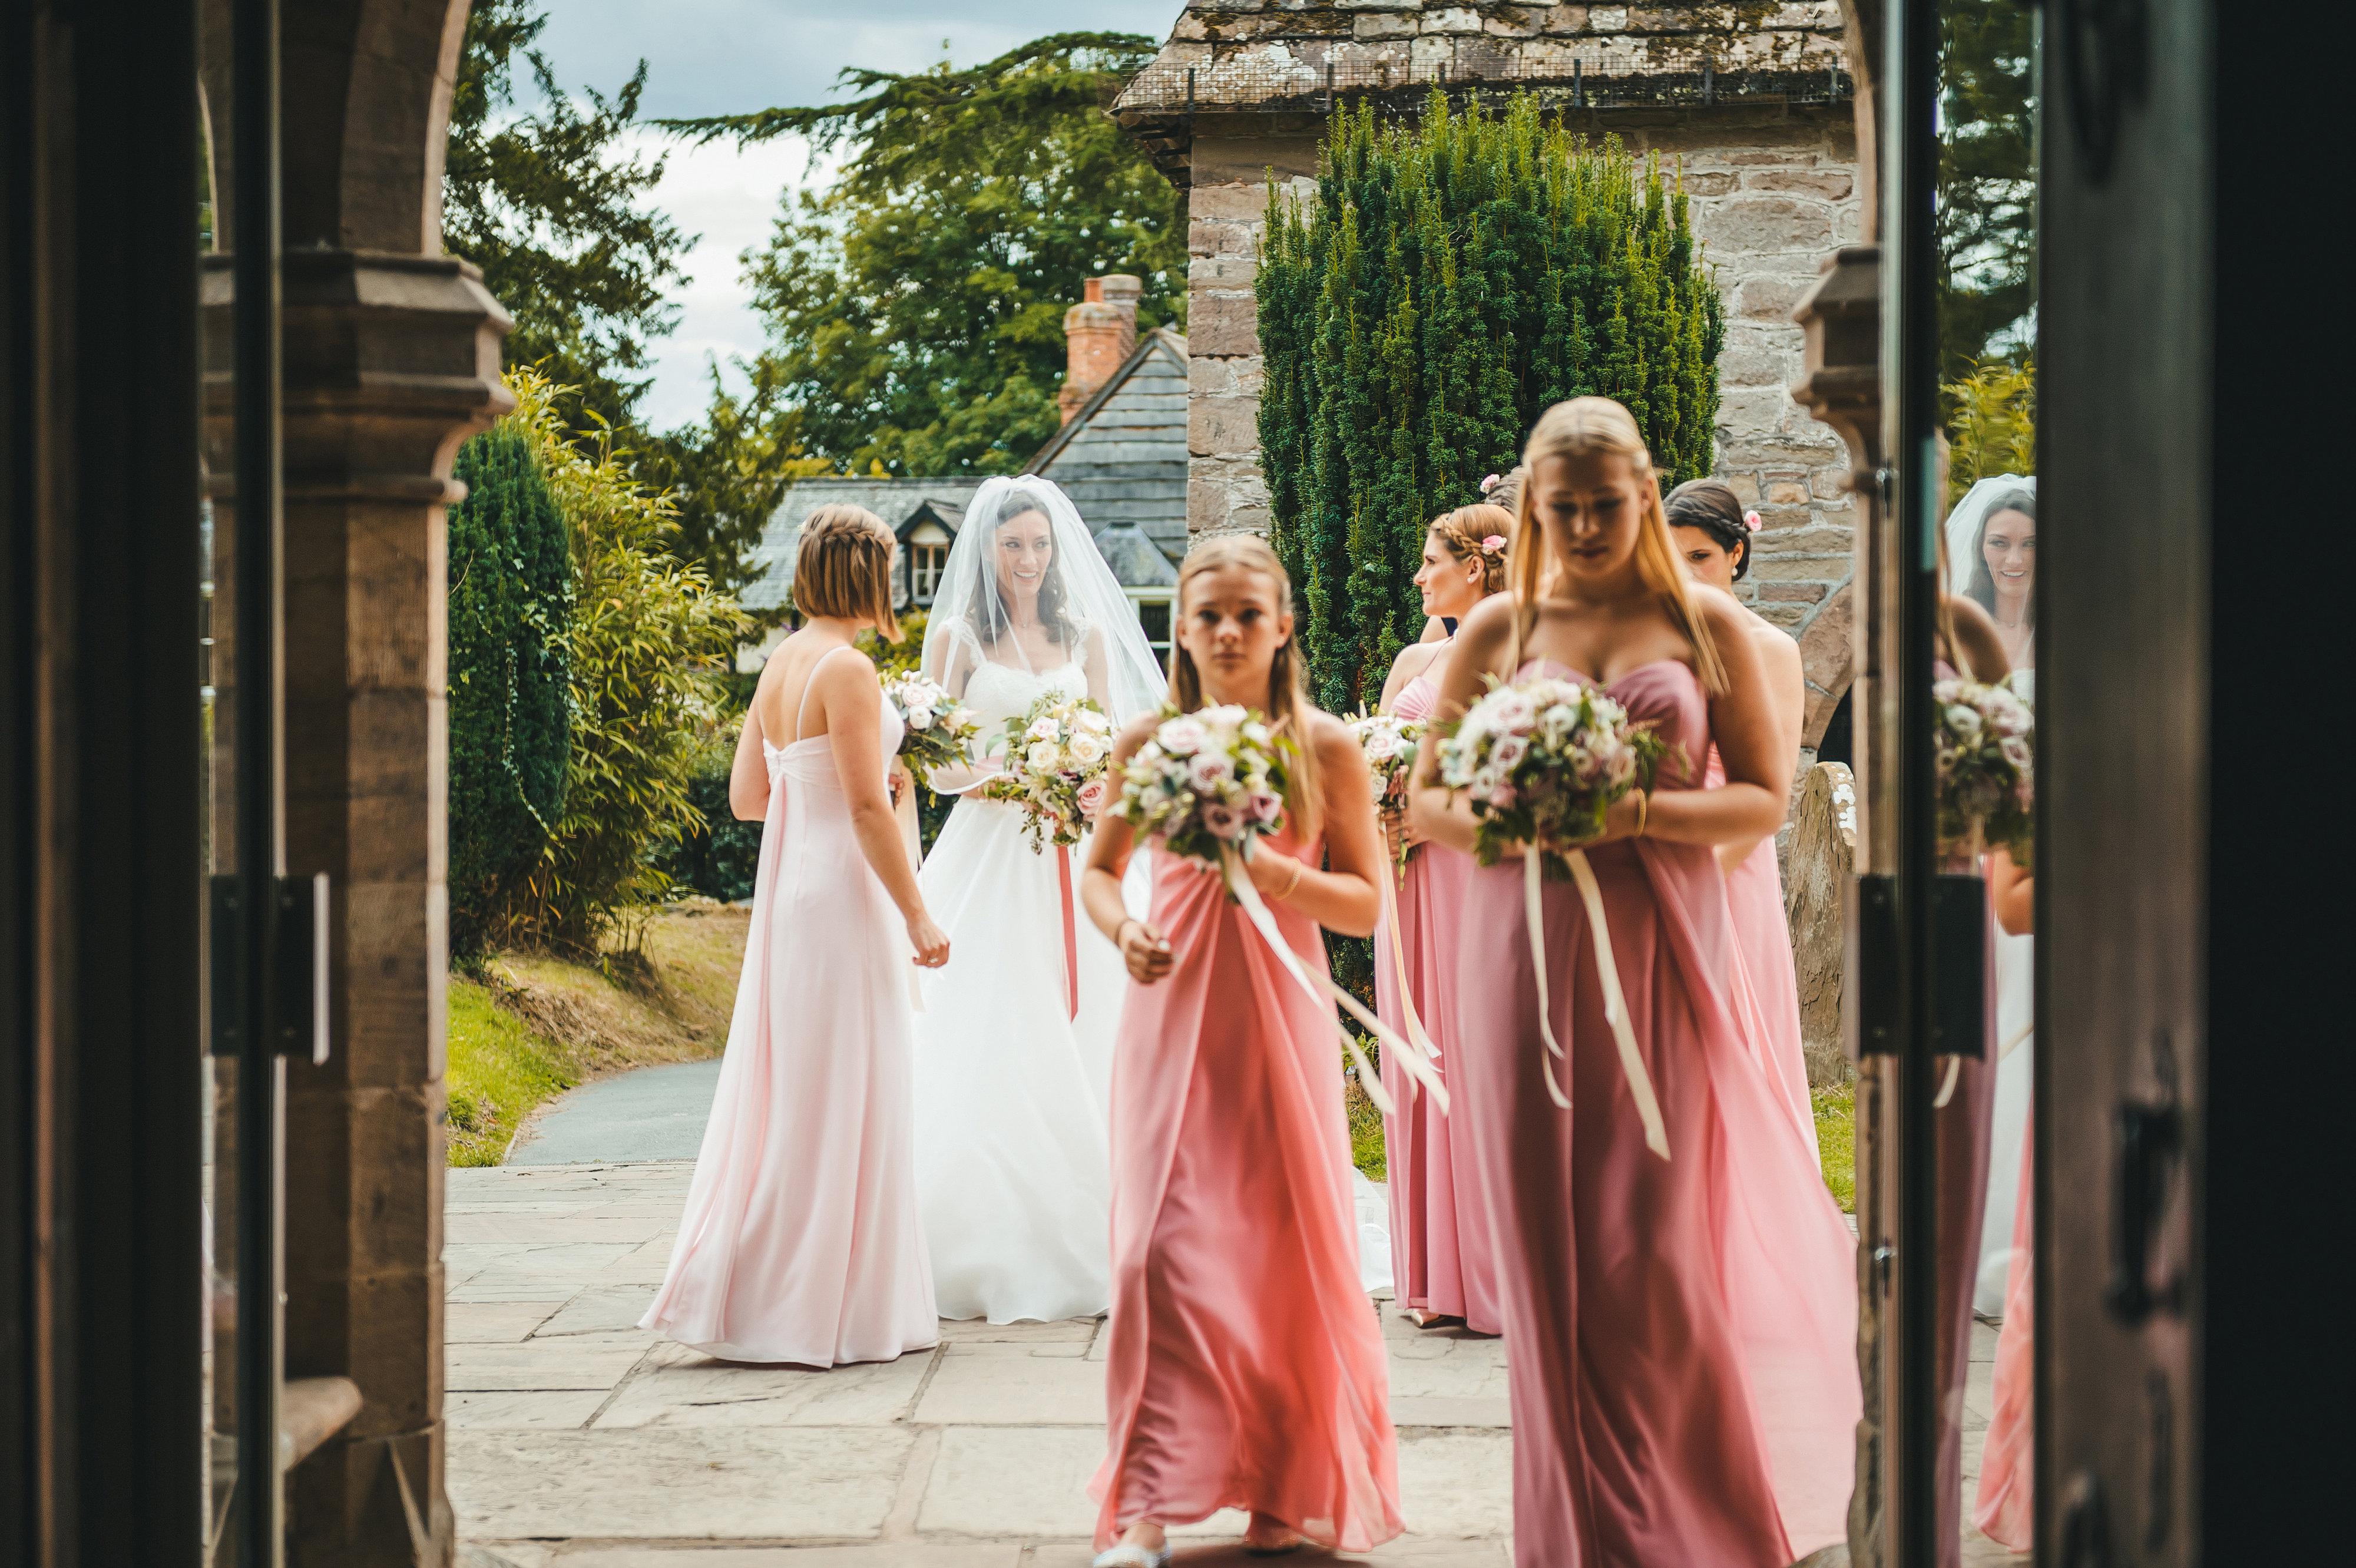 Helen & Andrew 3 designer wedding dresses by Caroline Castigliano